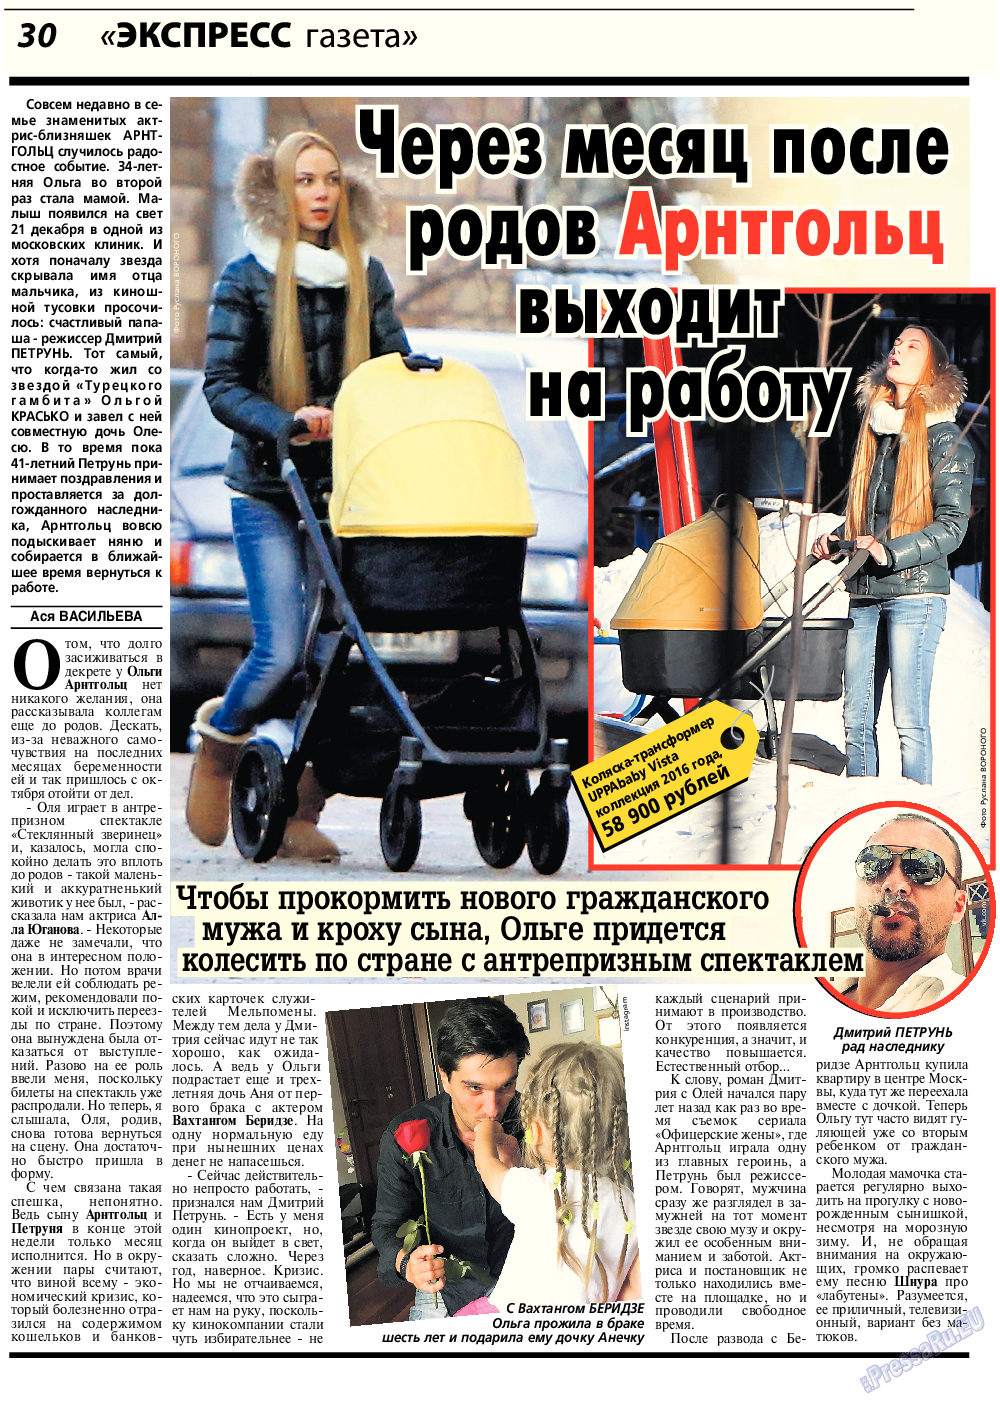 Экспресс газета (газета). 2017 год, номер 2, стр. 30